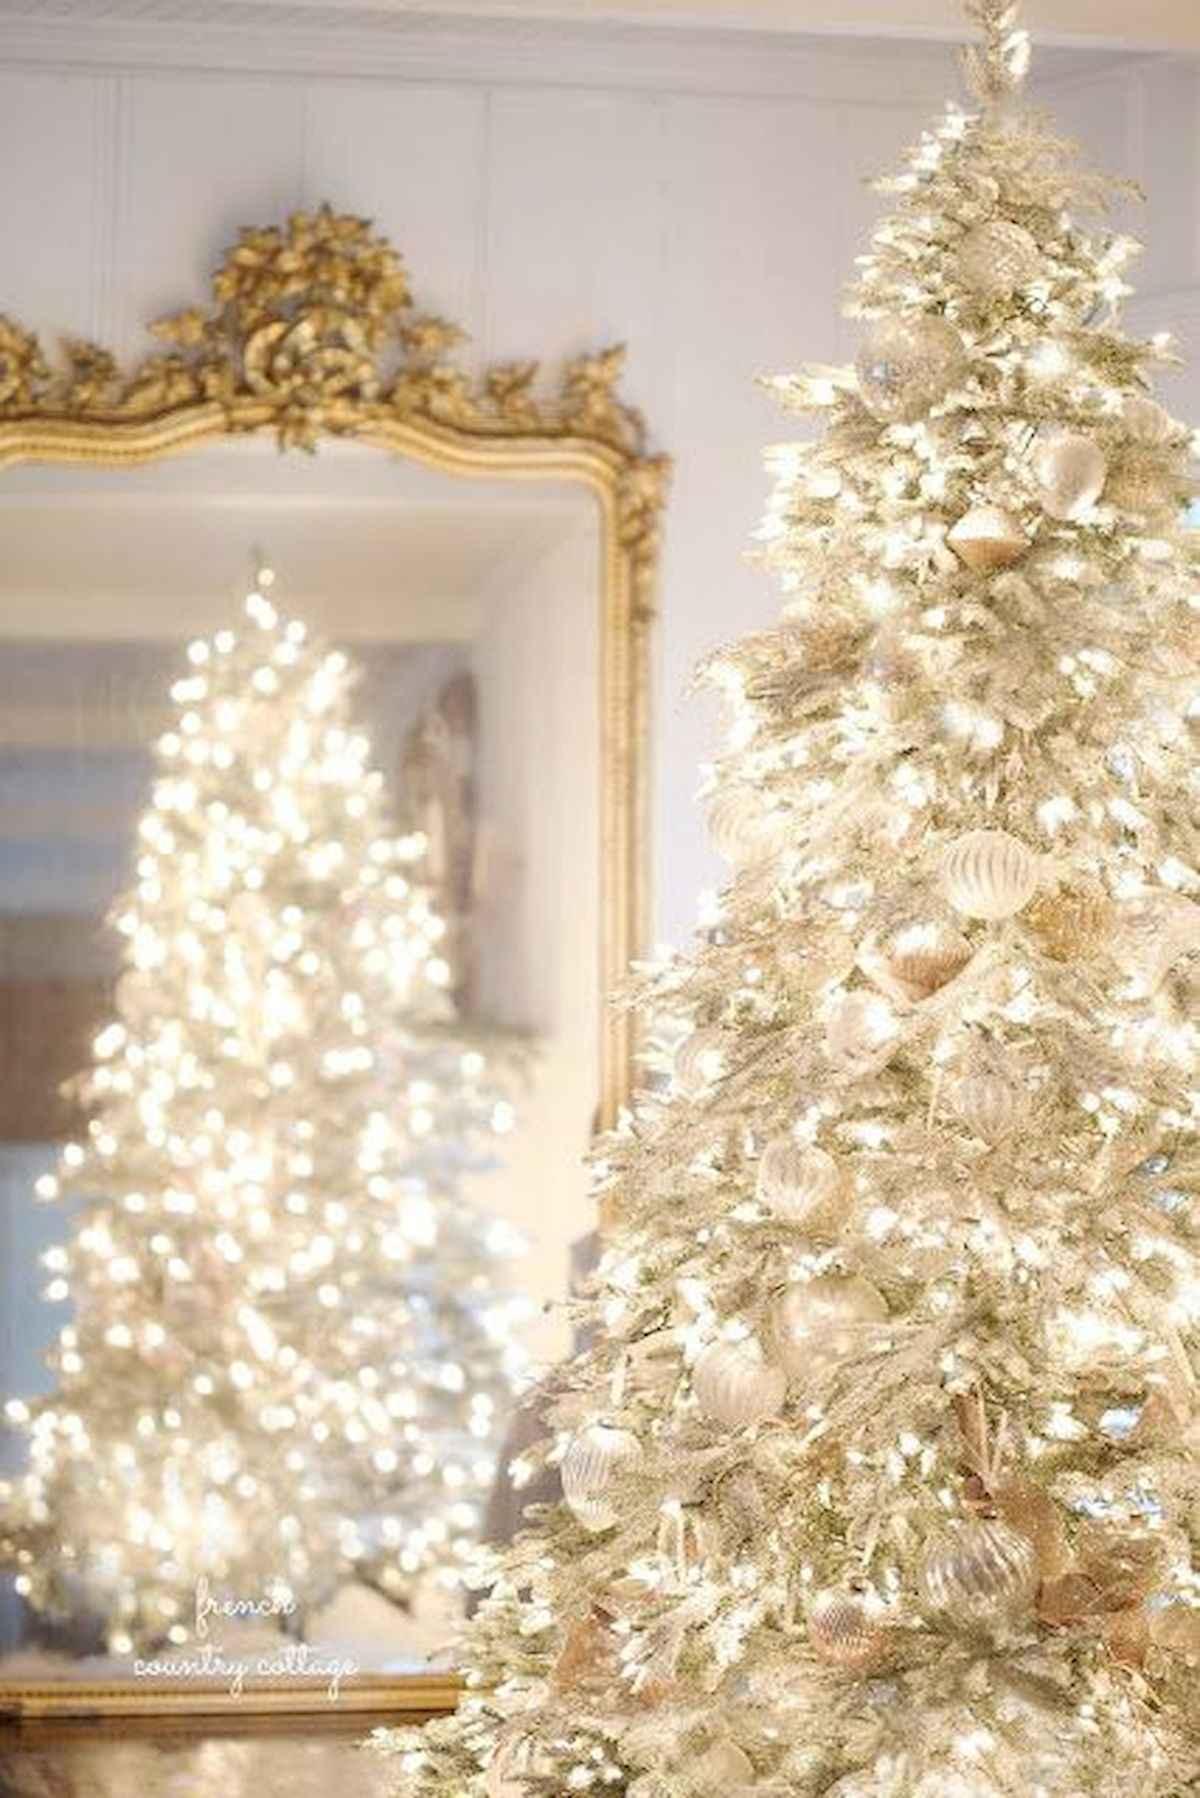 40 elegant christmas tree decorations ideas (26)